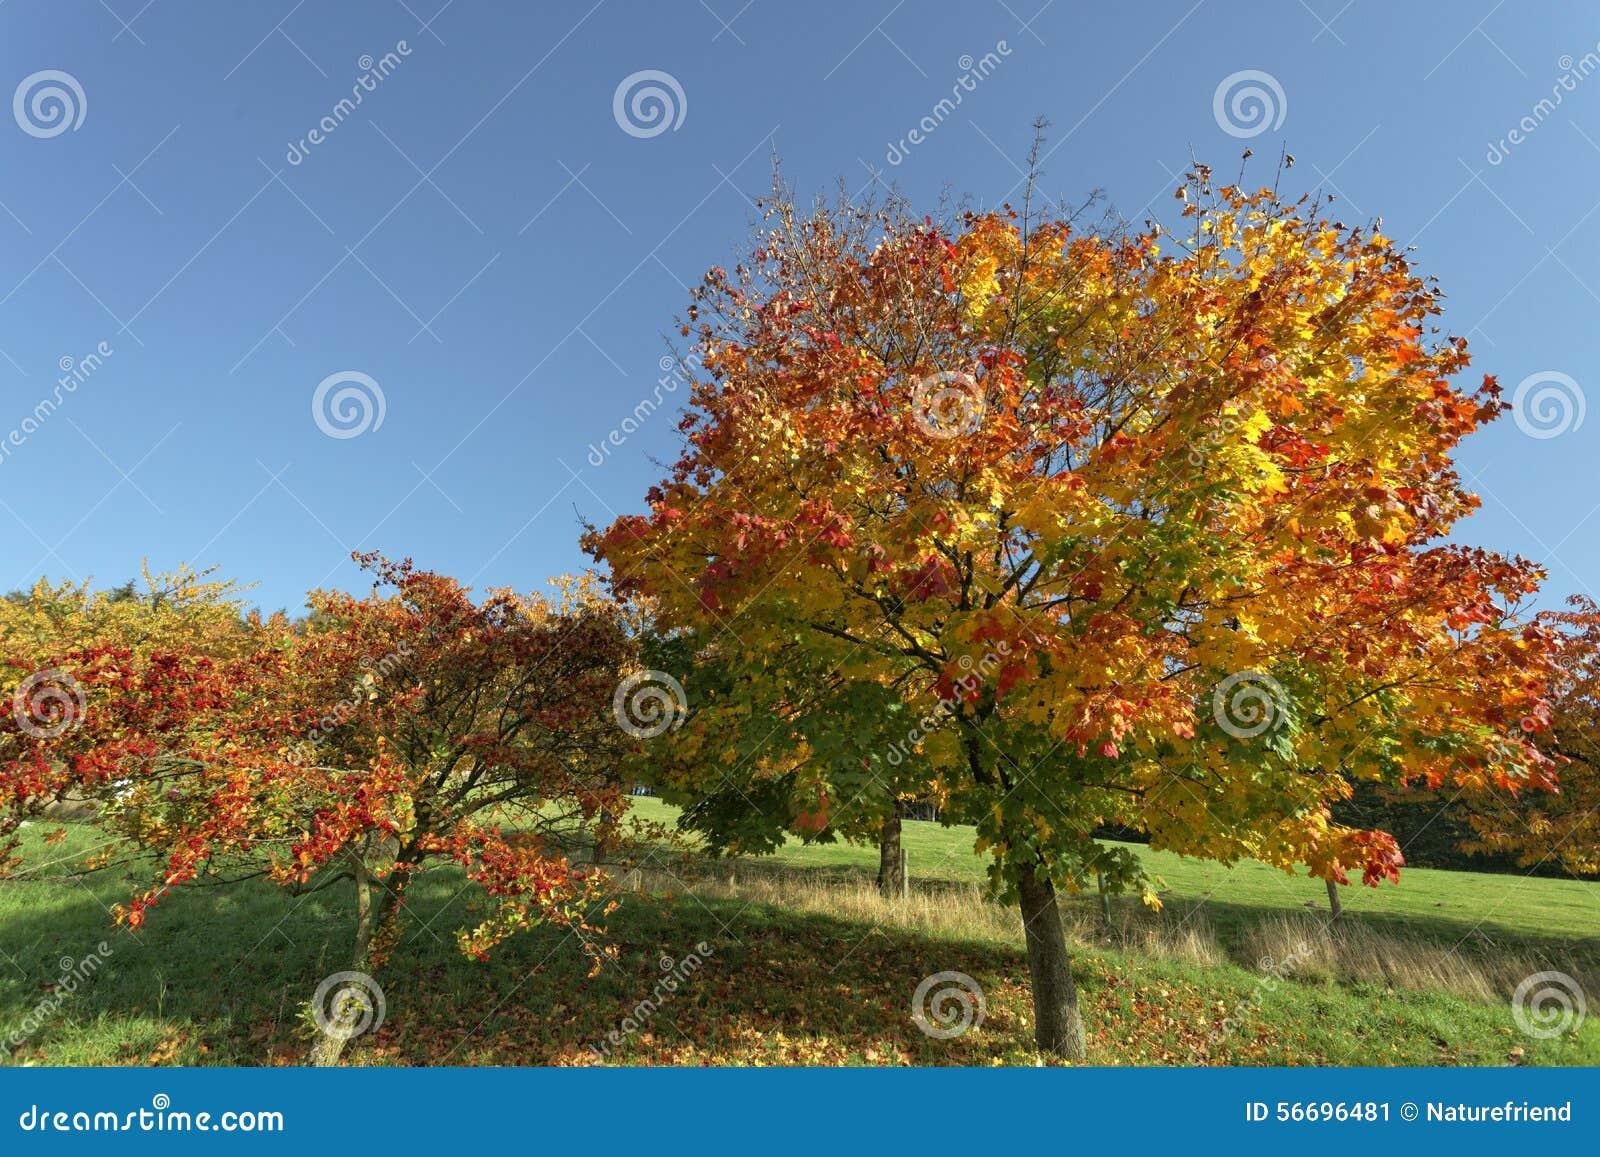 Acer platanoides acero riccio in autunno hagen bassa for Acero riccio